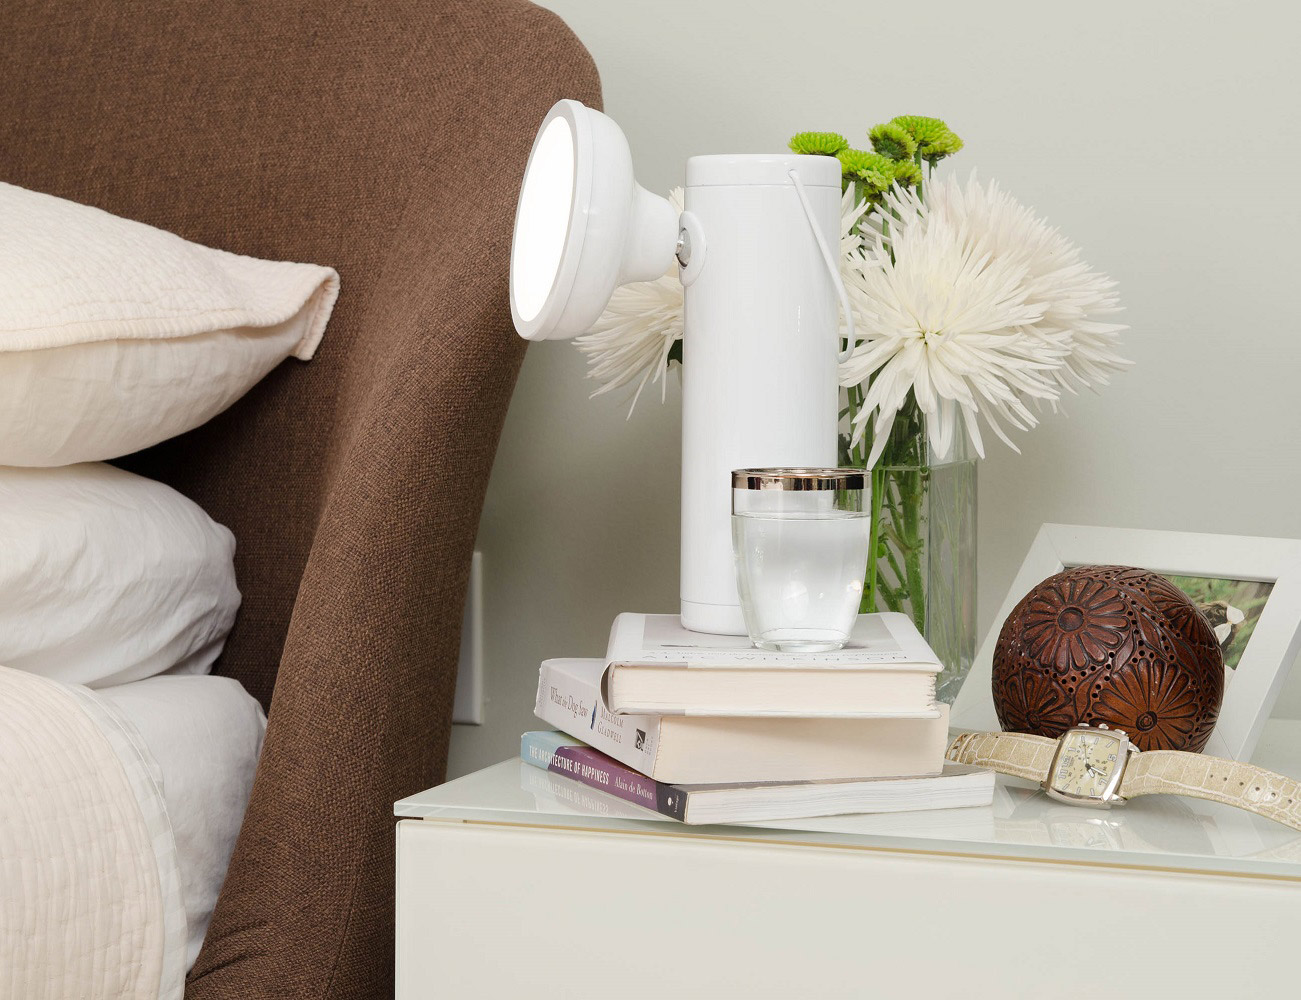 M Lamp by Juniper Designs